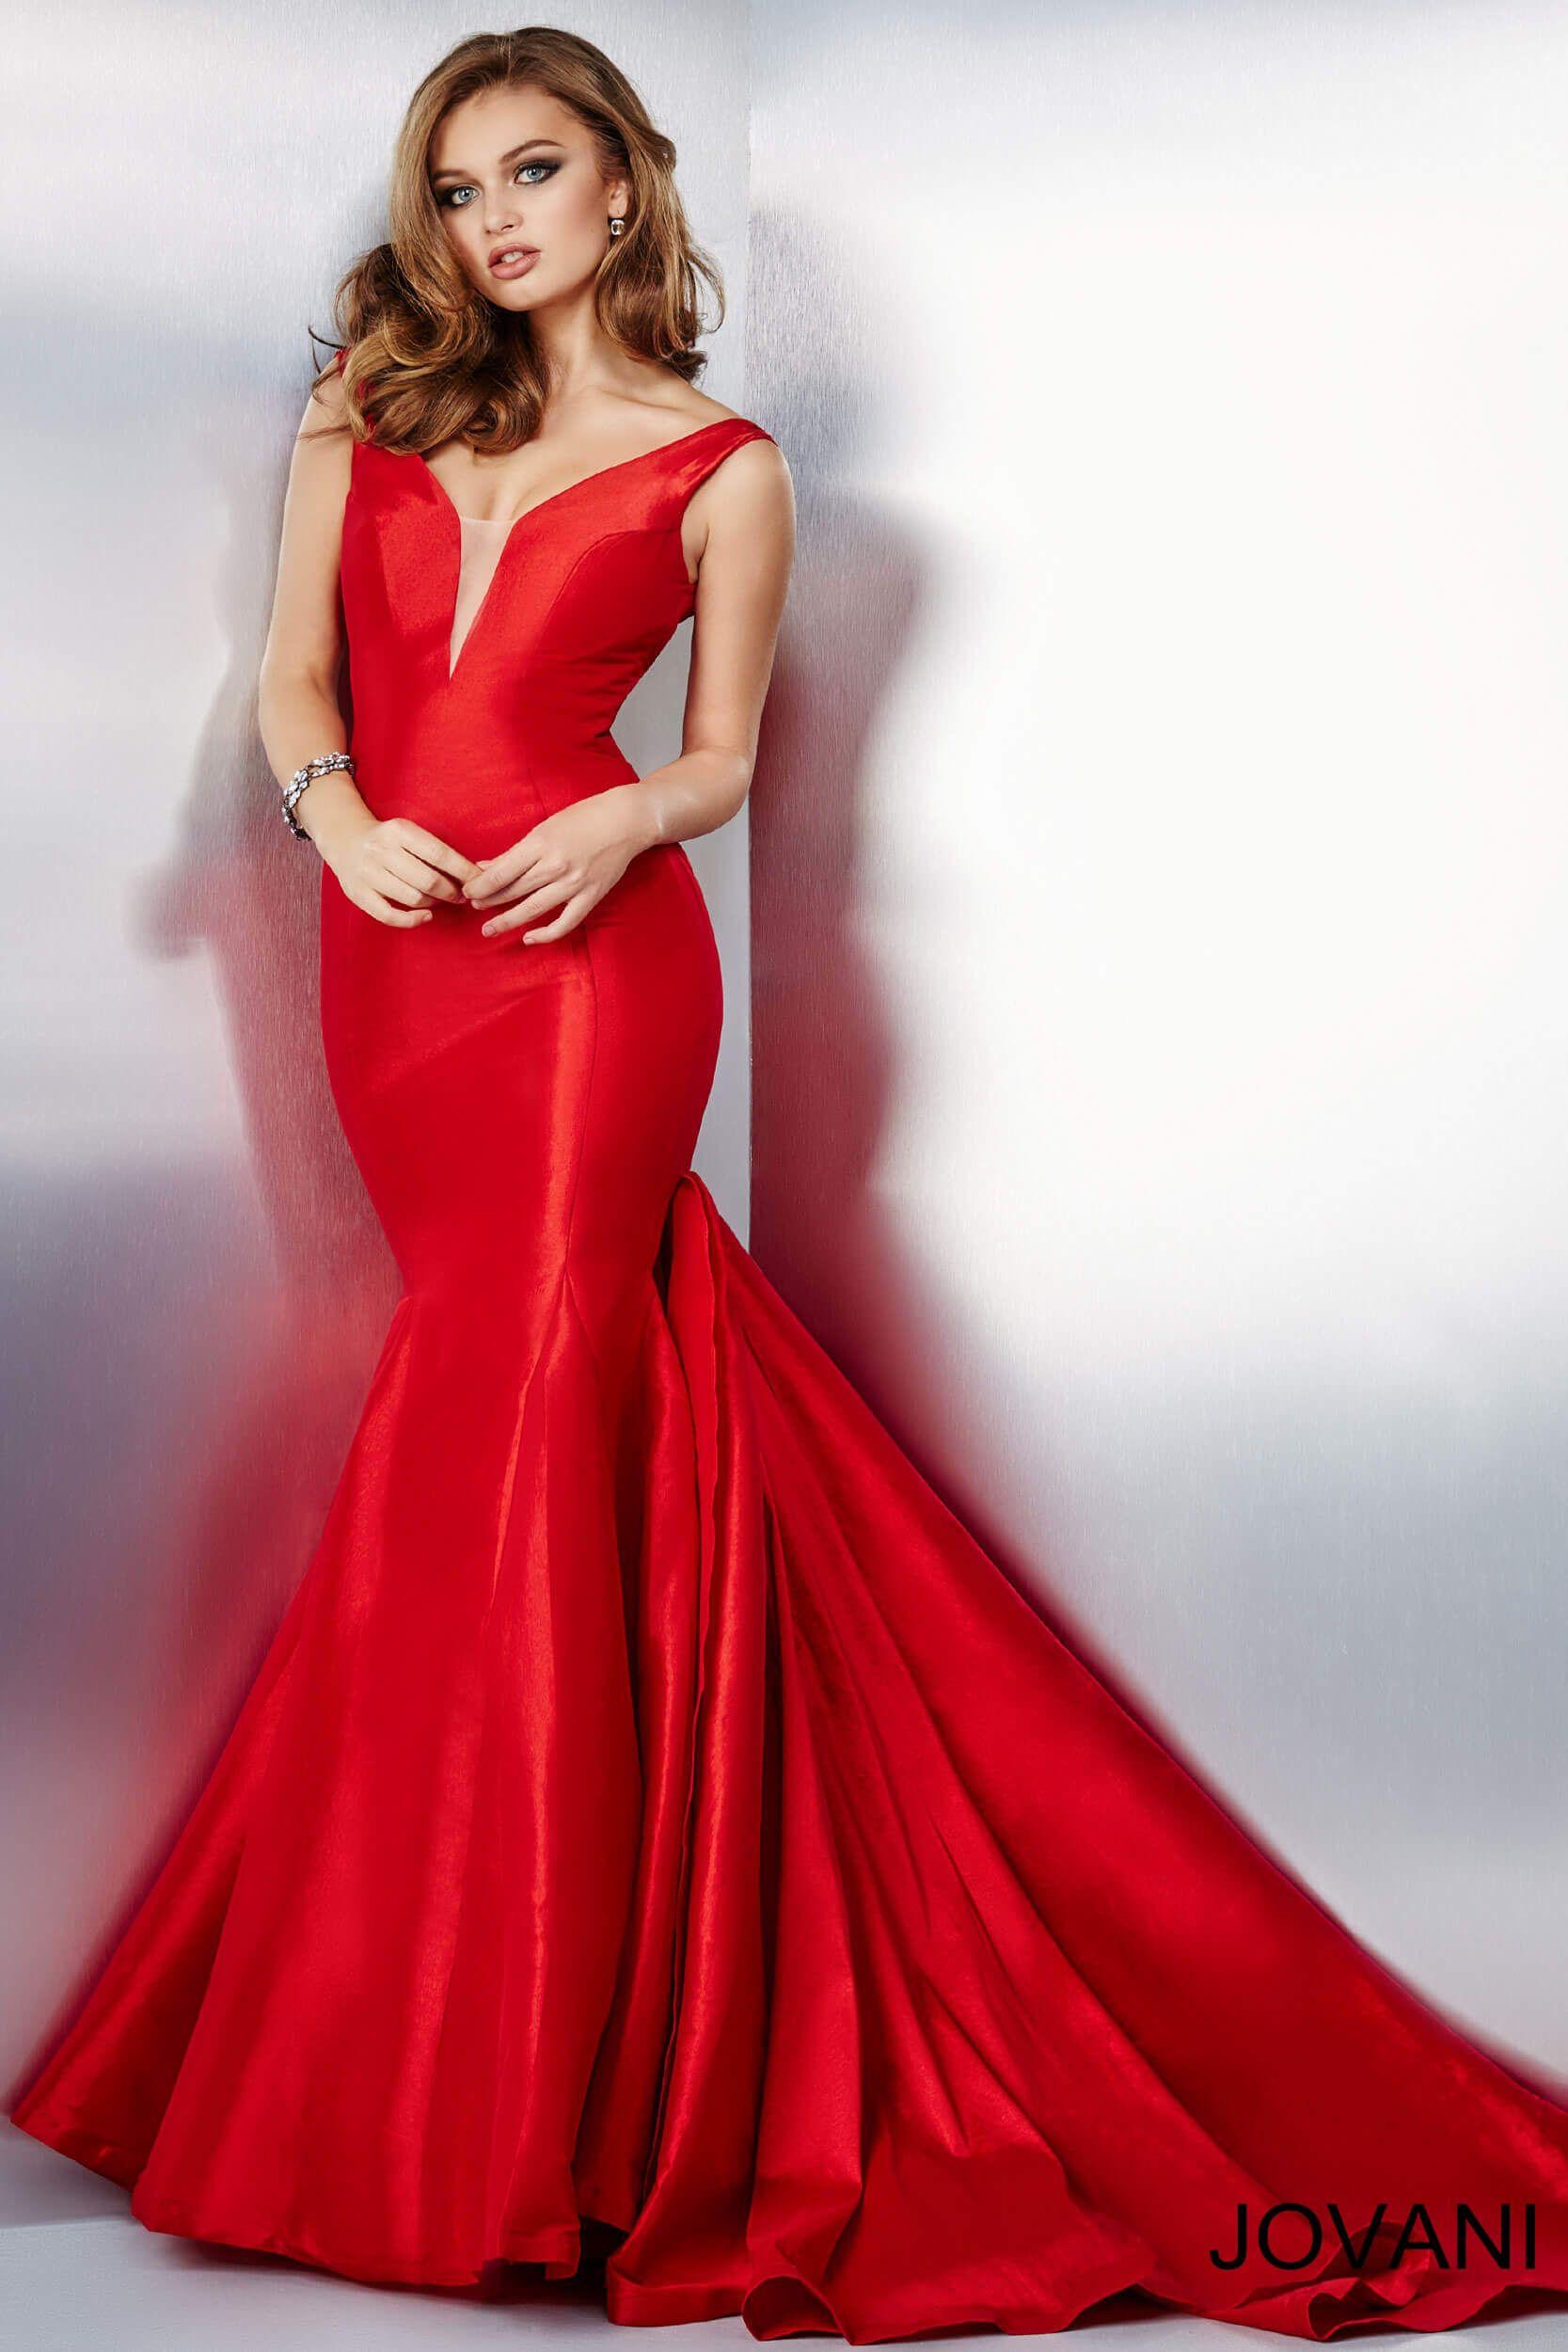 Red Mermaid Style Prom Dress - Ocodea.com